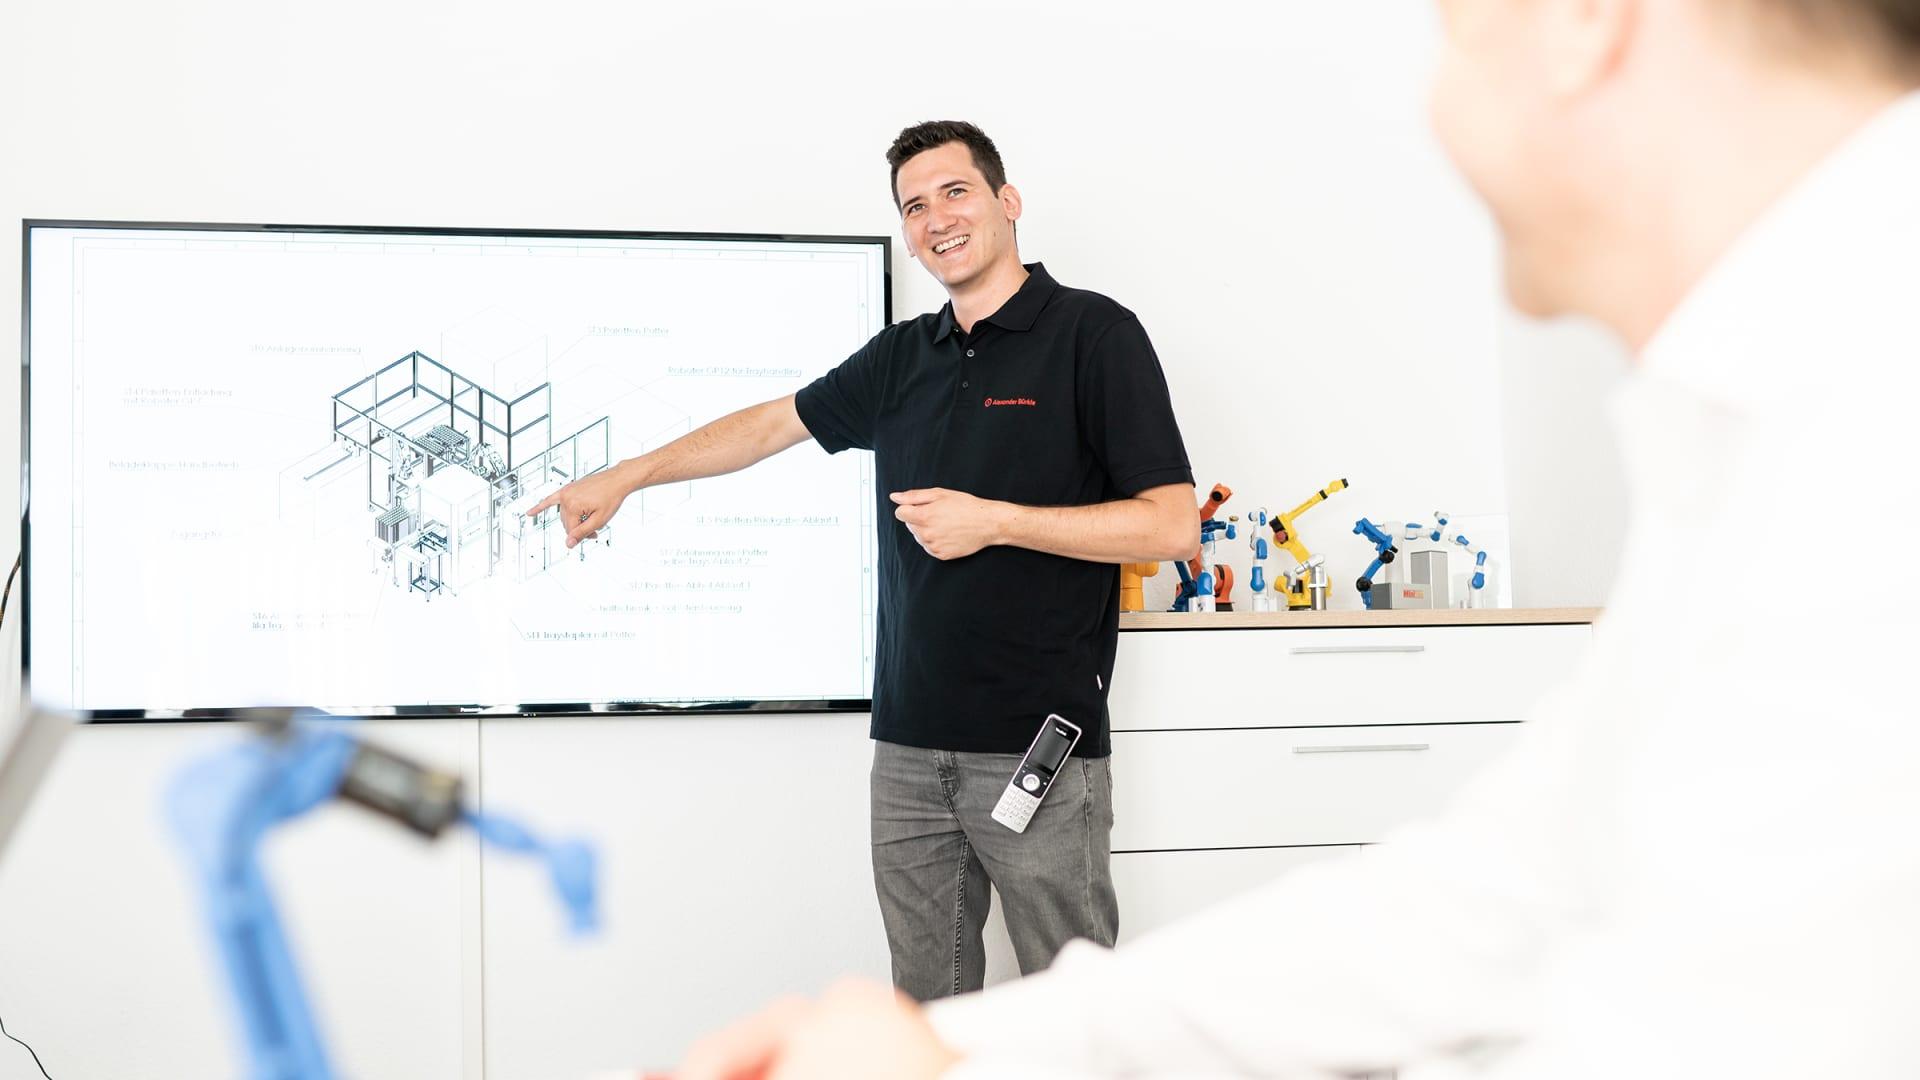 Akademie - Alexander Bürkle robotic solutions